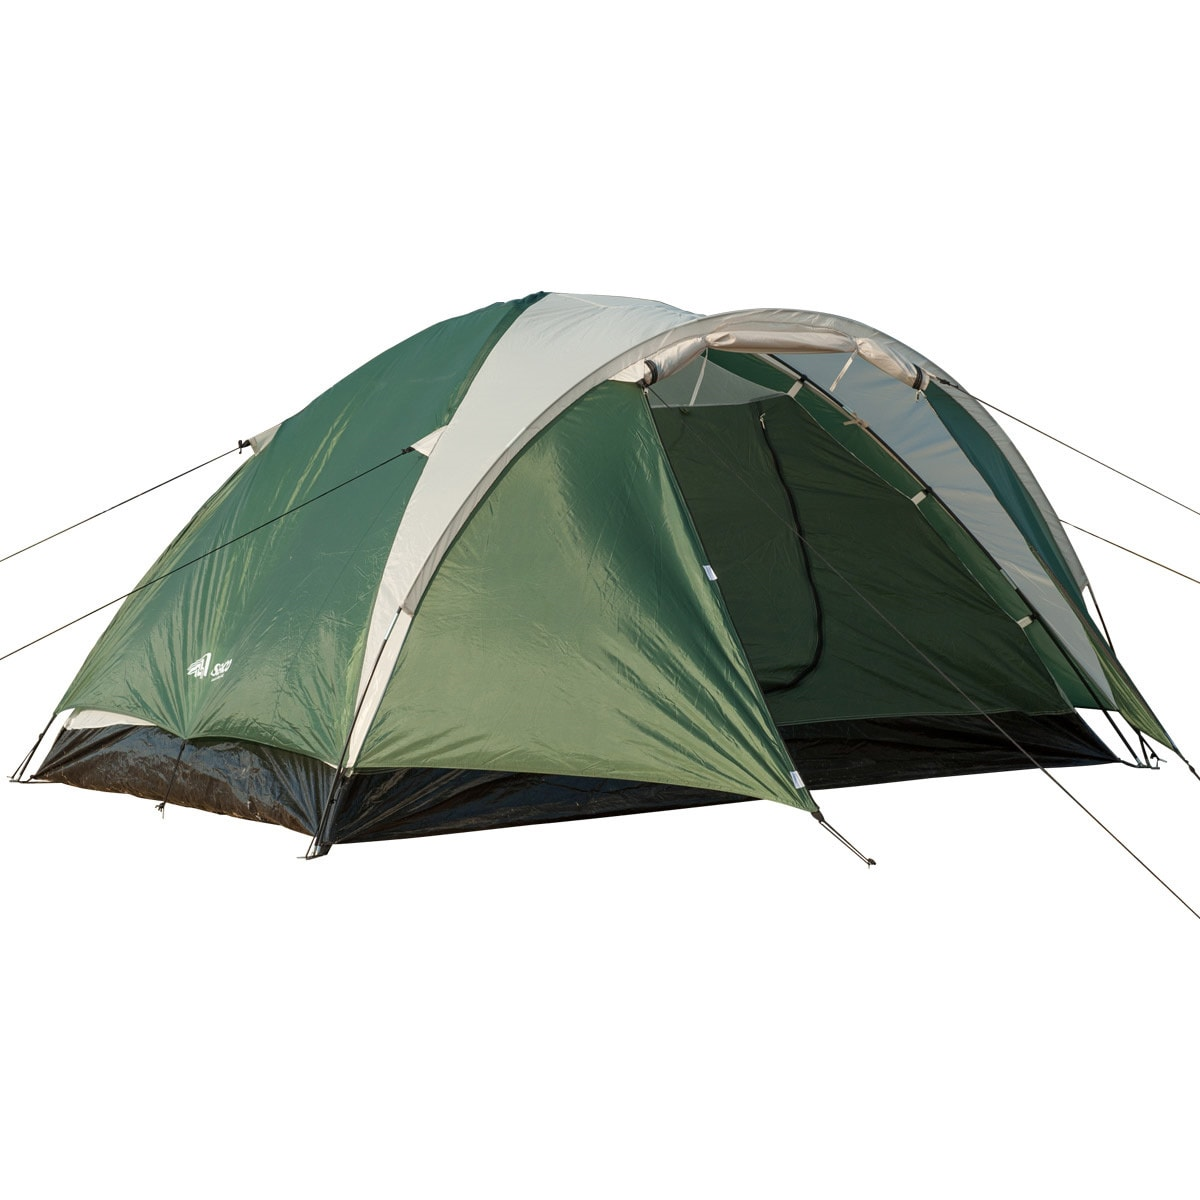 Semoo Double Layer 3-4 Person 3-Season Lightweight C&.  sc 1 st  Nextag & u0026#34;4 seasonu0026#34; tent 2 person | Camping u0026 Hiking | Compare ...